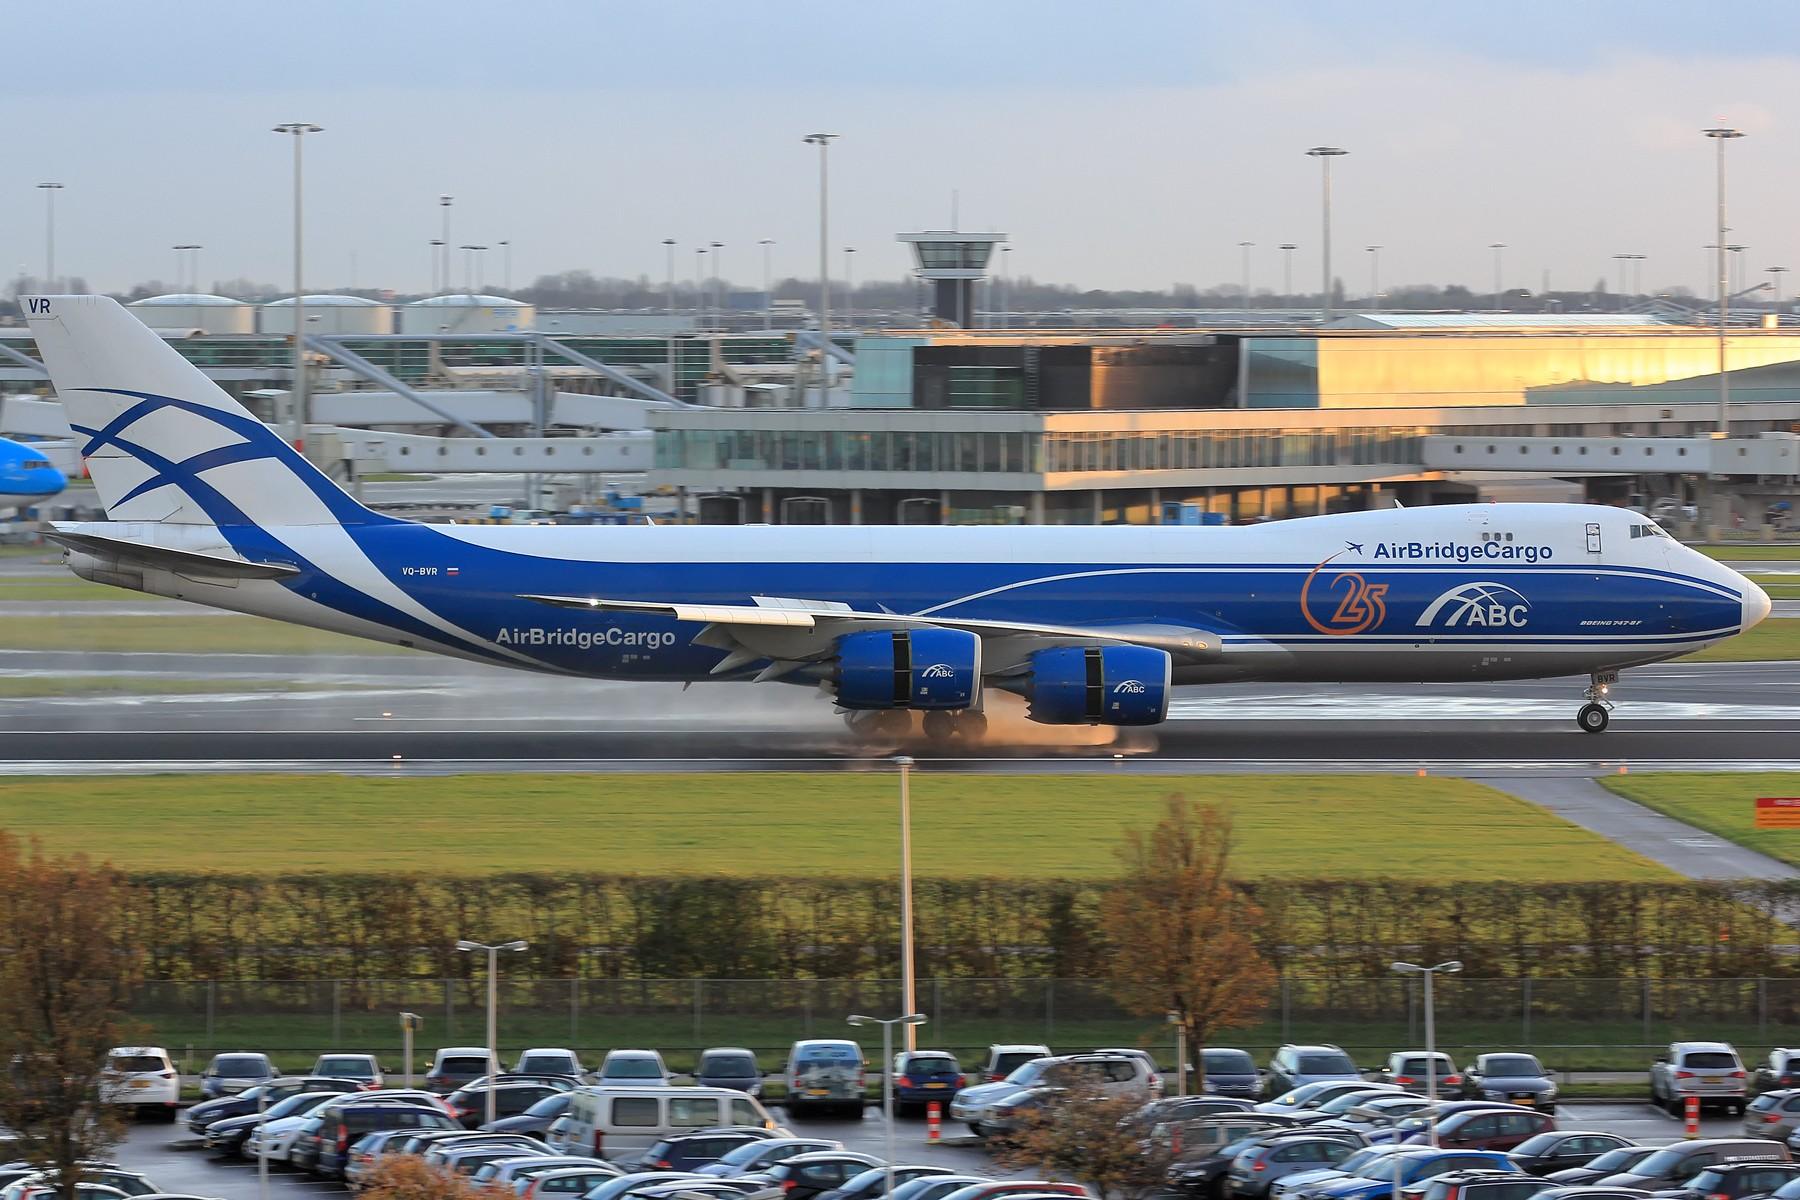 Re:[原创]【AMS】伪塔台视角吹水几张 1800大图 BOEING 747-8F VQ-BVR 荷兰阿姆斯特丹史基浦机场